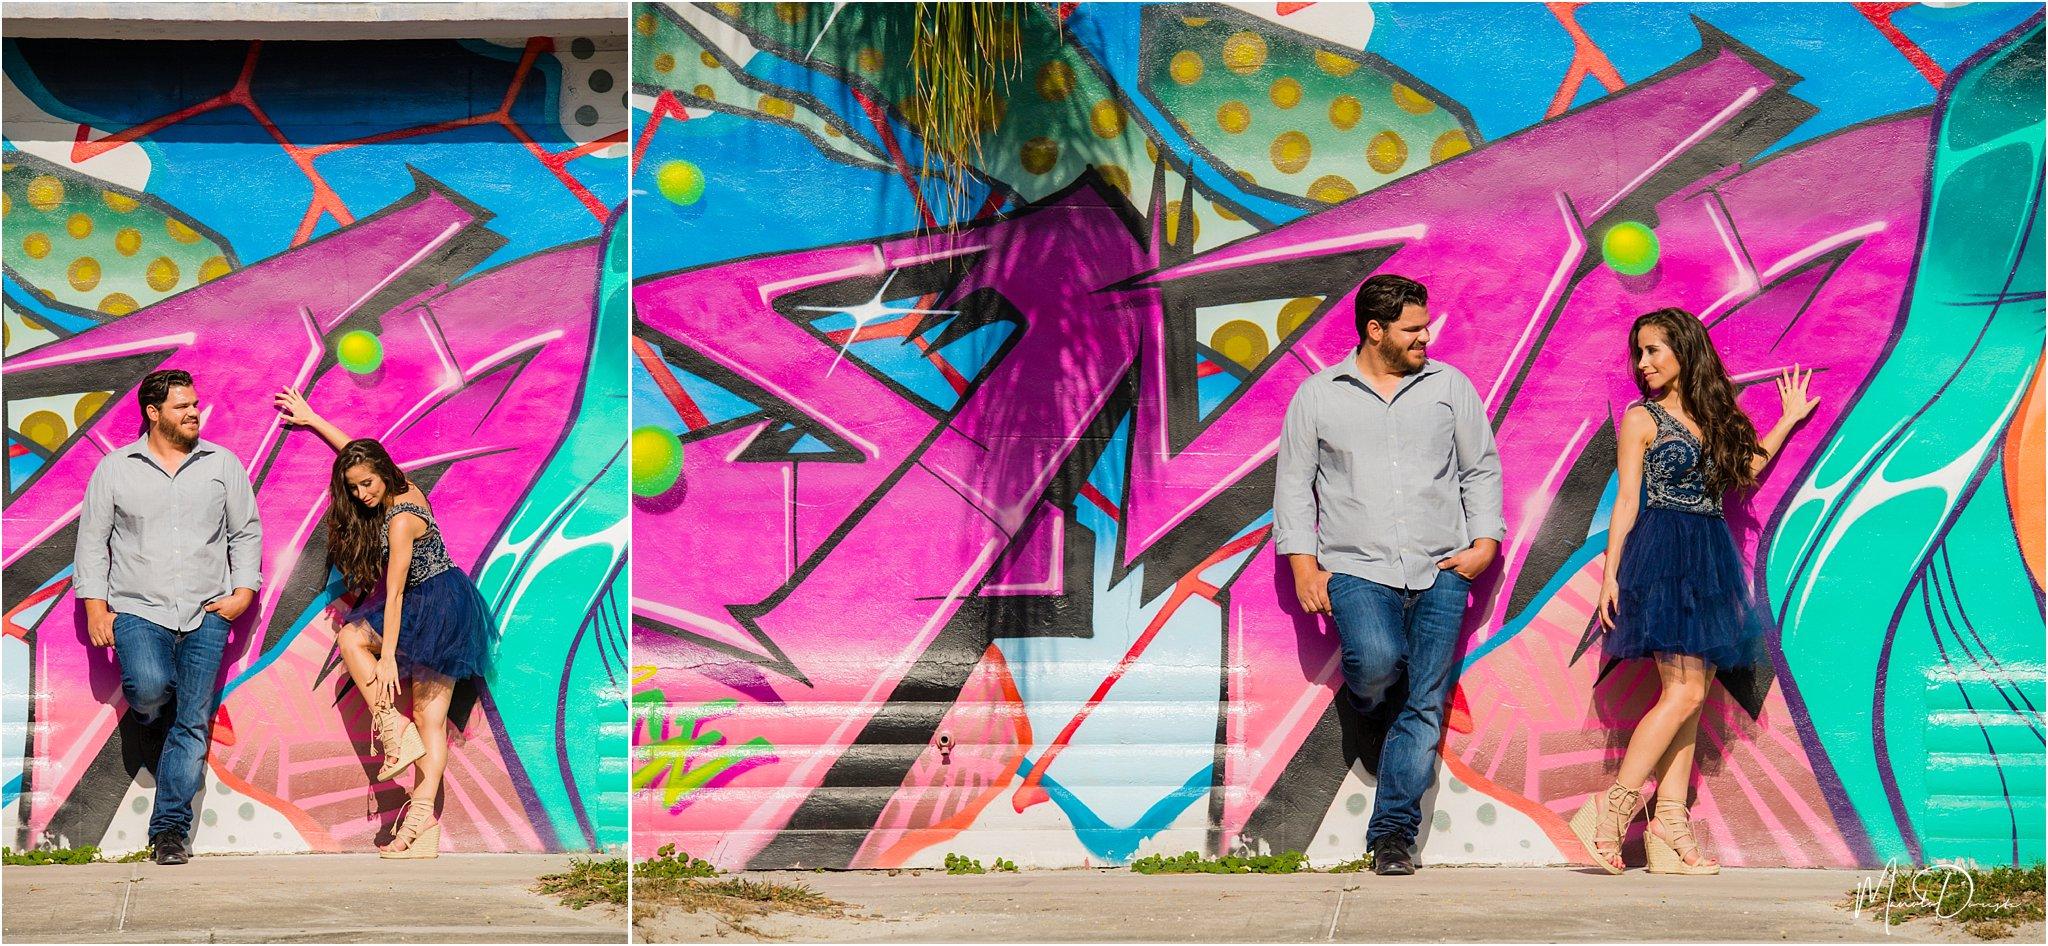 0603_ManoloDoreste_InFocusStudios_Wedding_Family_Photography_Miami_MiamiPhotographer.jpg